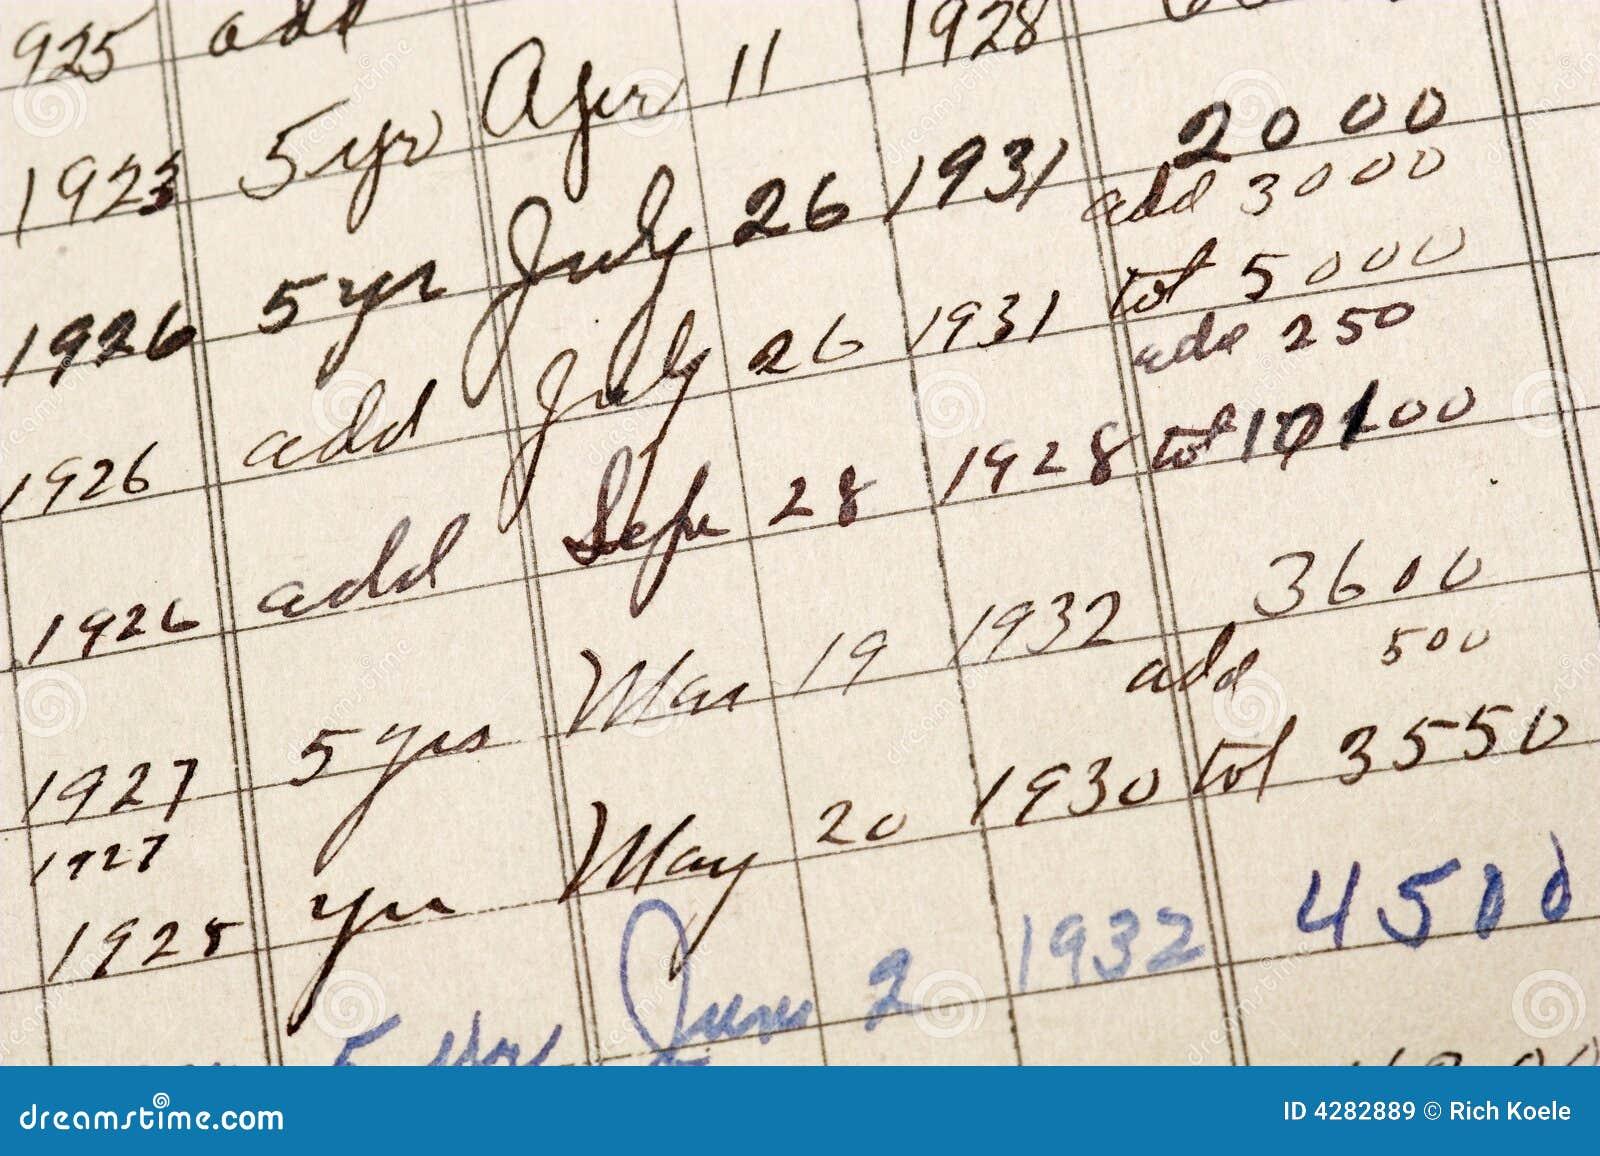 depression era accounting ledger stock image image of script